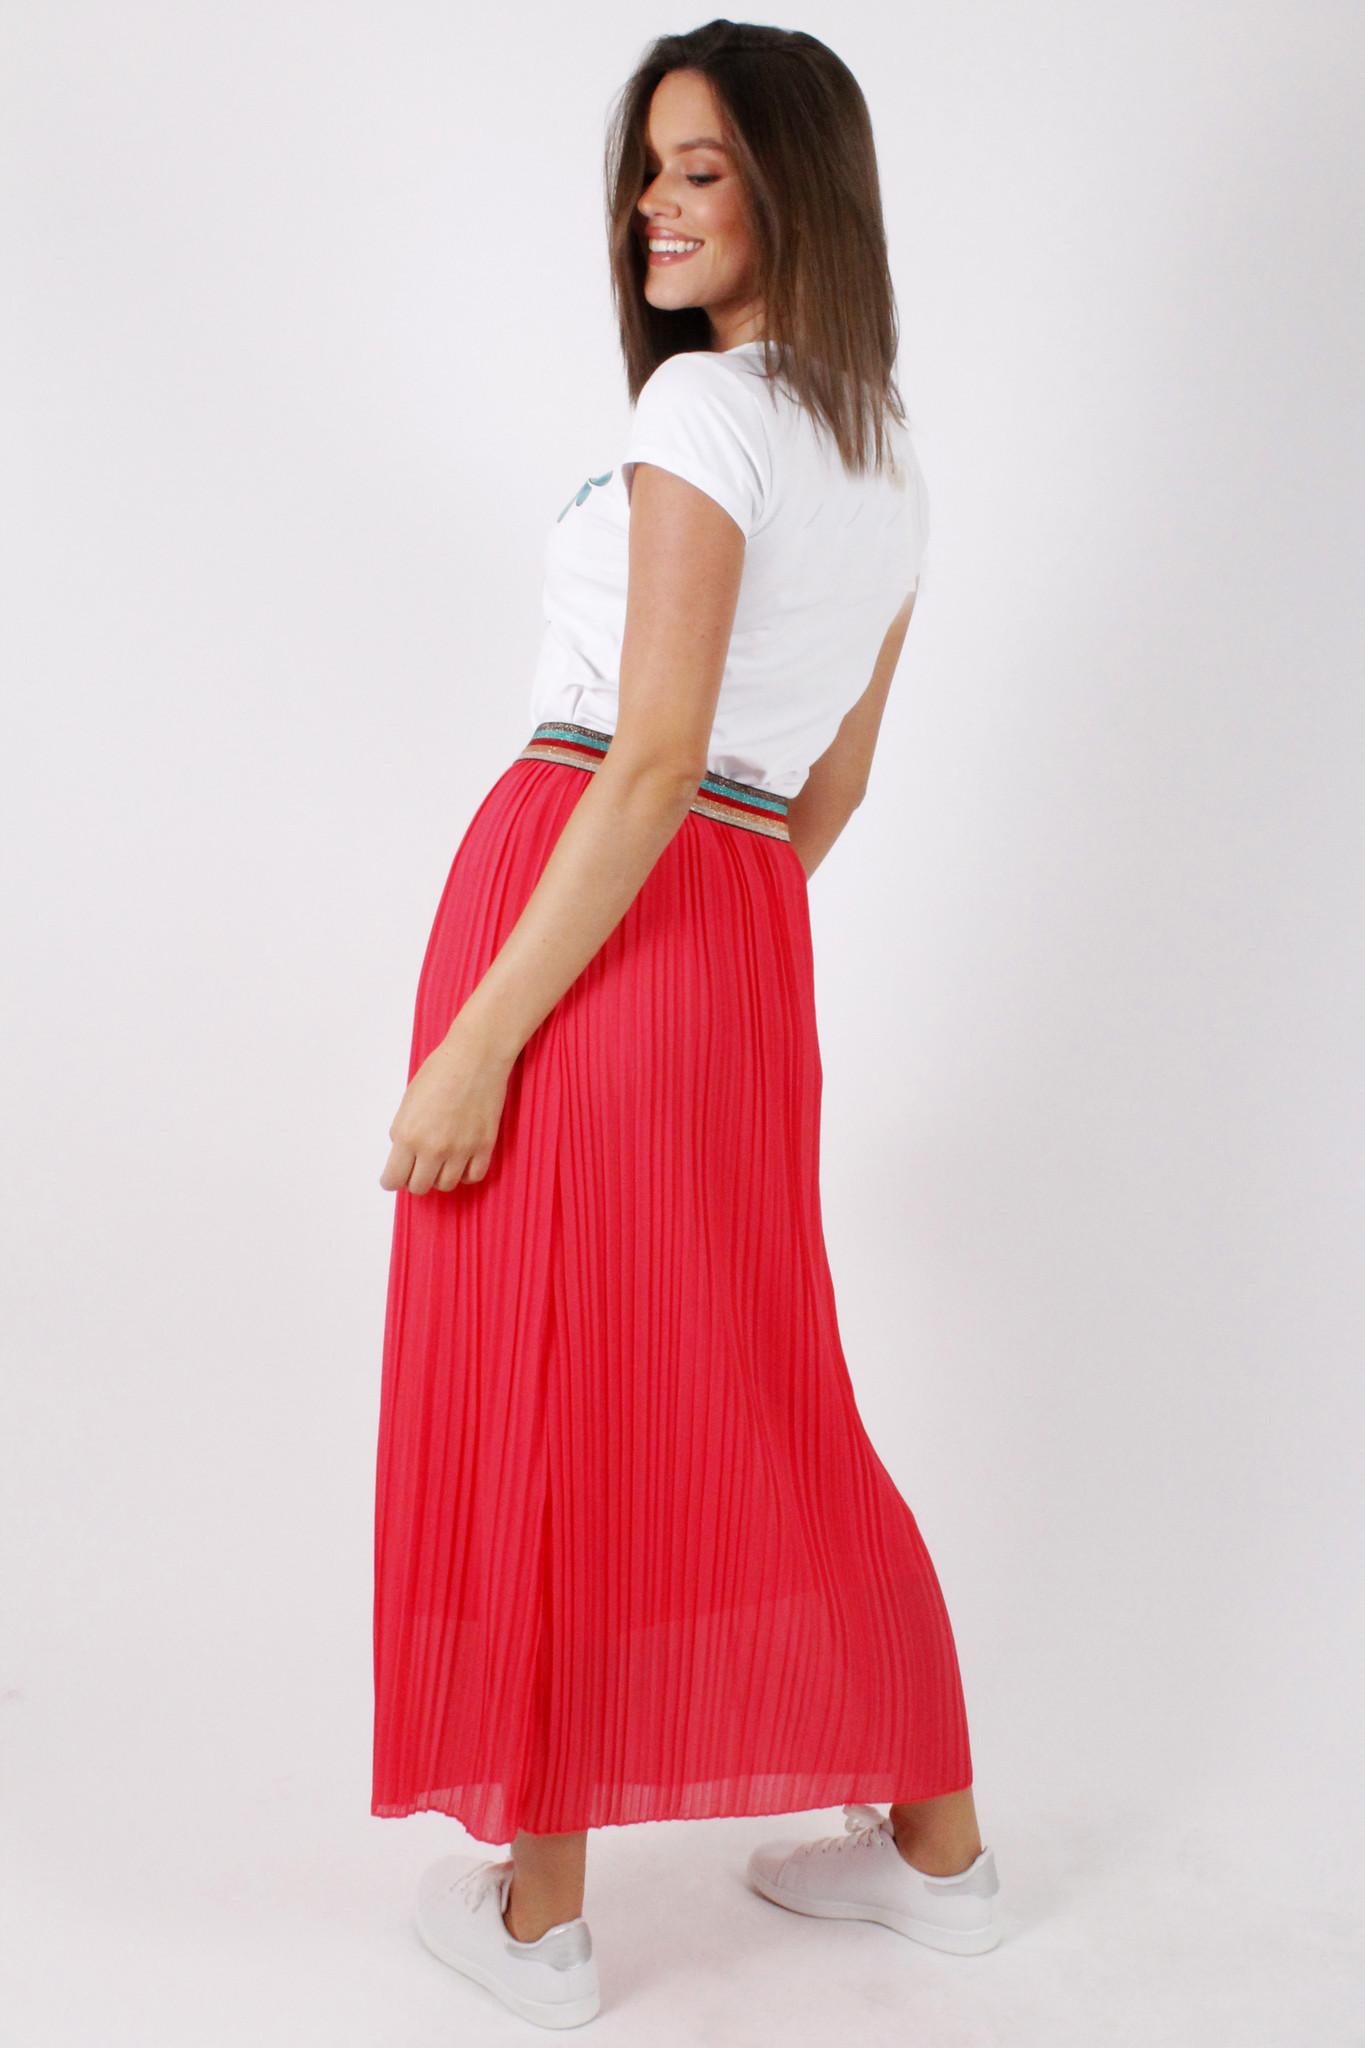 GL Eva Plisse Skirt Coral/Multicolor Lurex Border